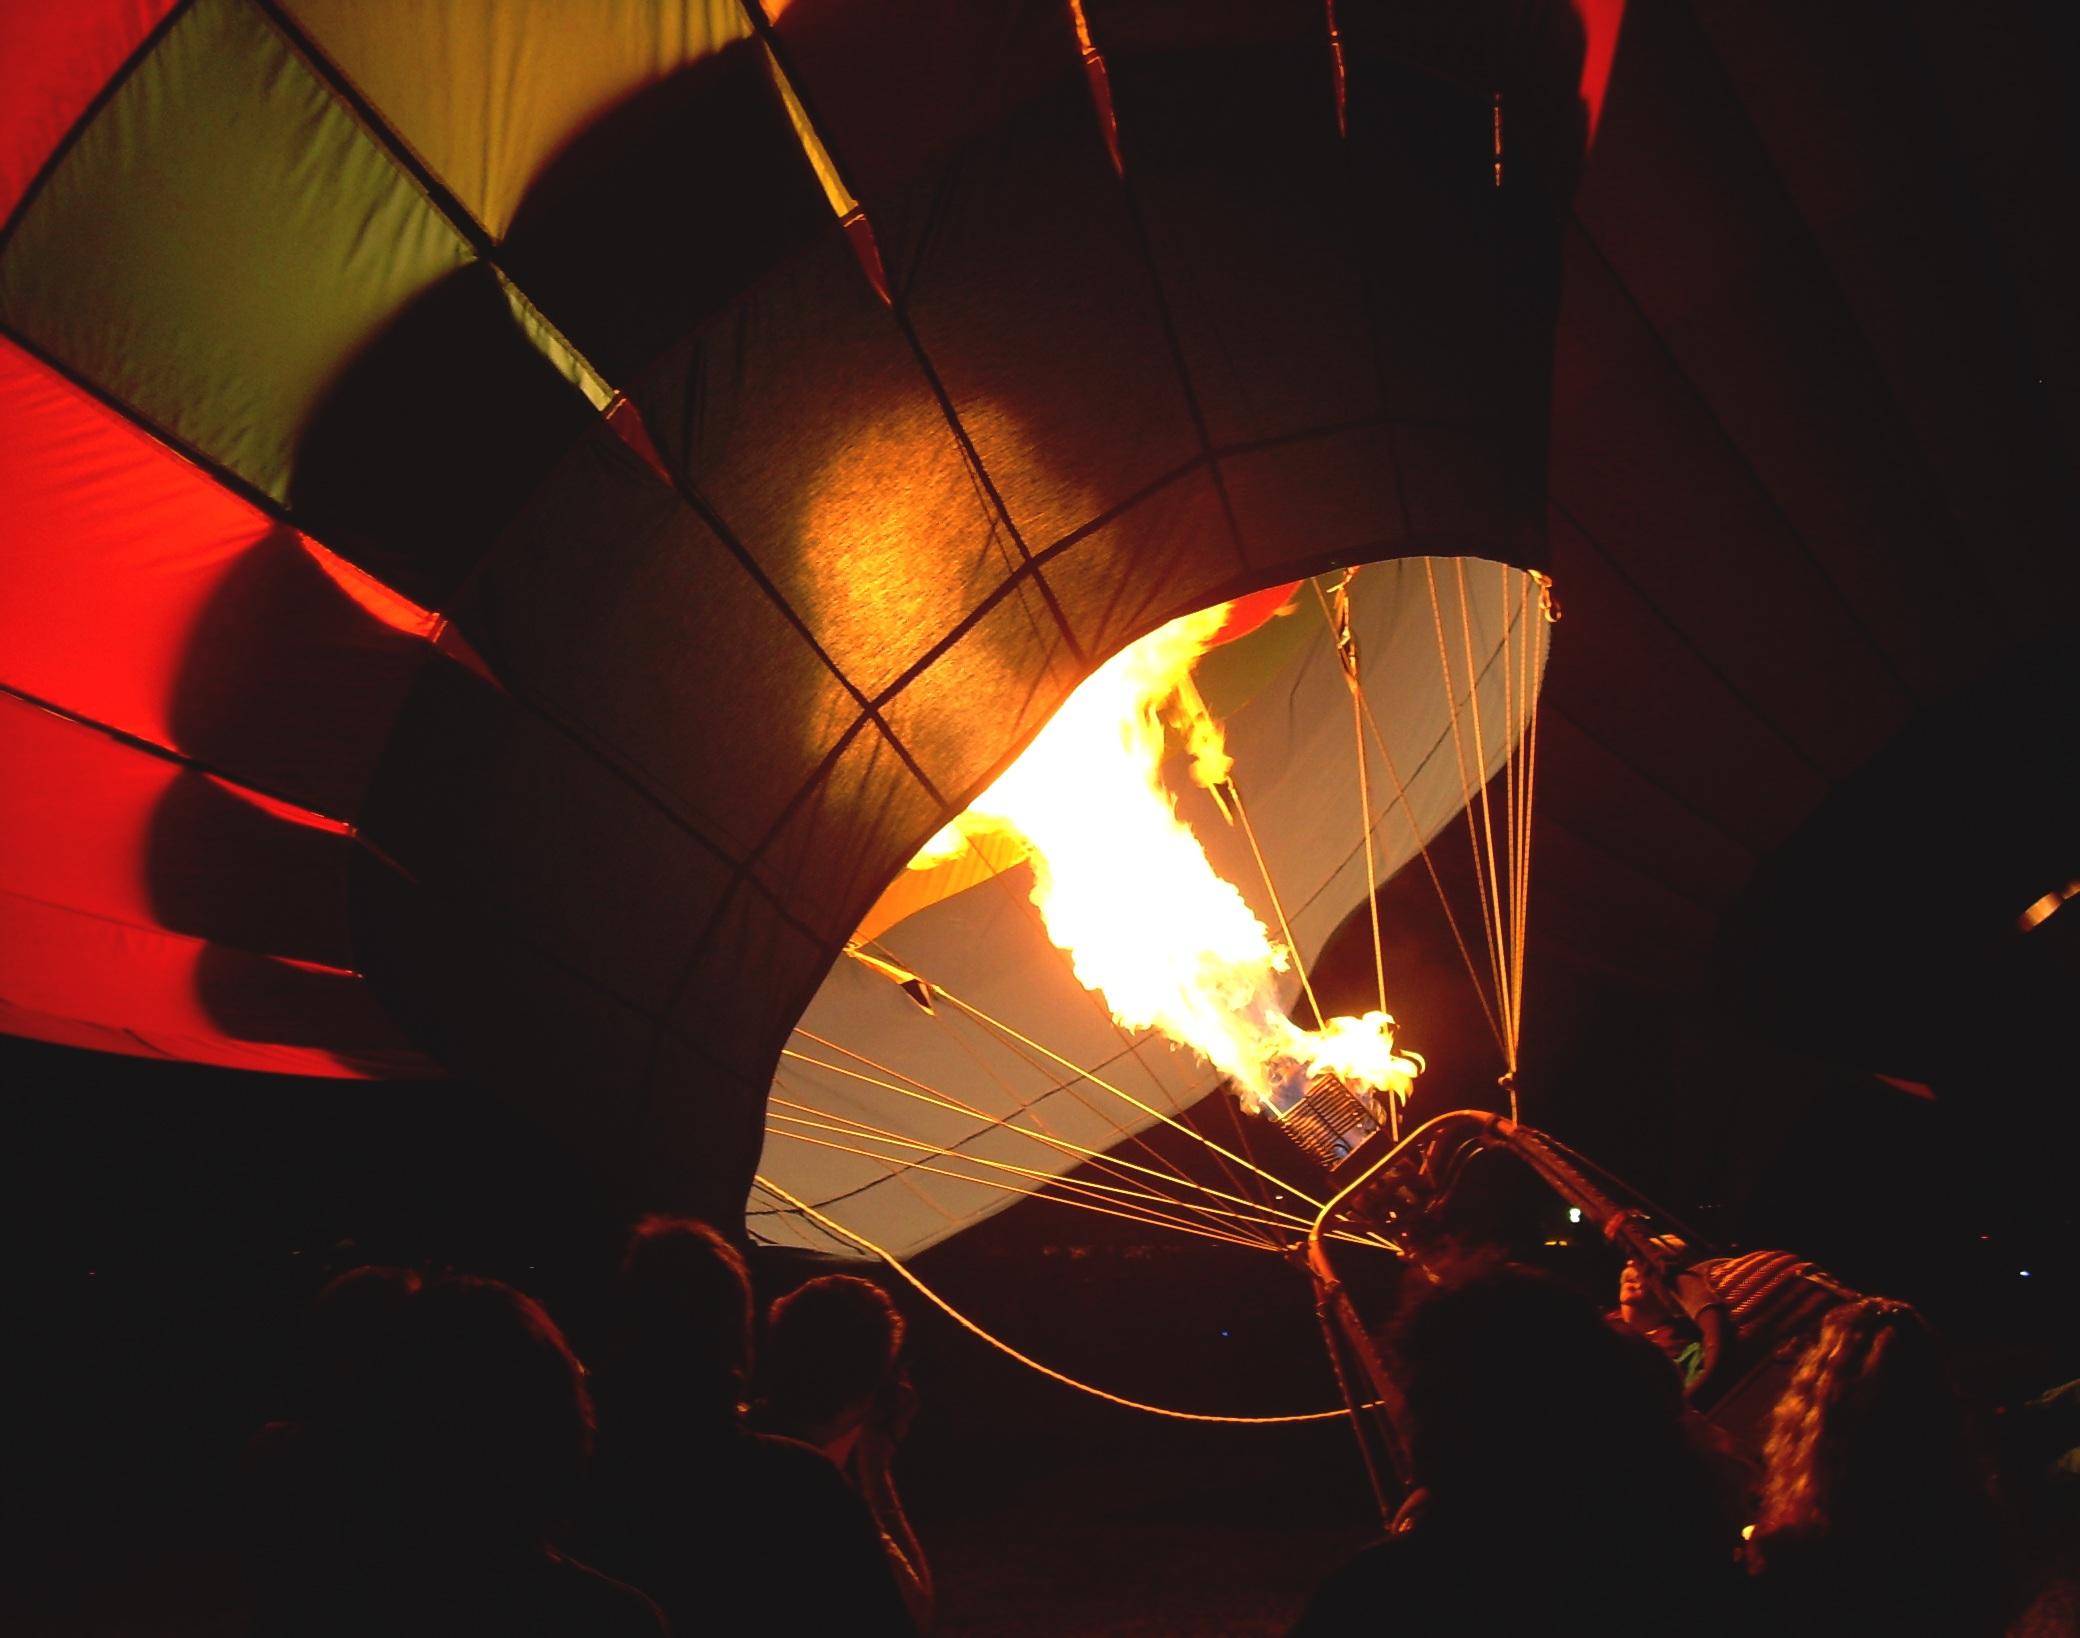 Ballonnen Met Licht : Kostenlose foto : licht ballon heißluftballon dämmerung flugzeug